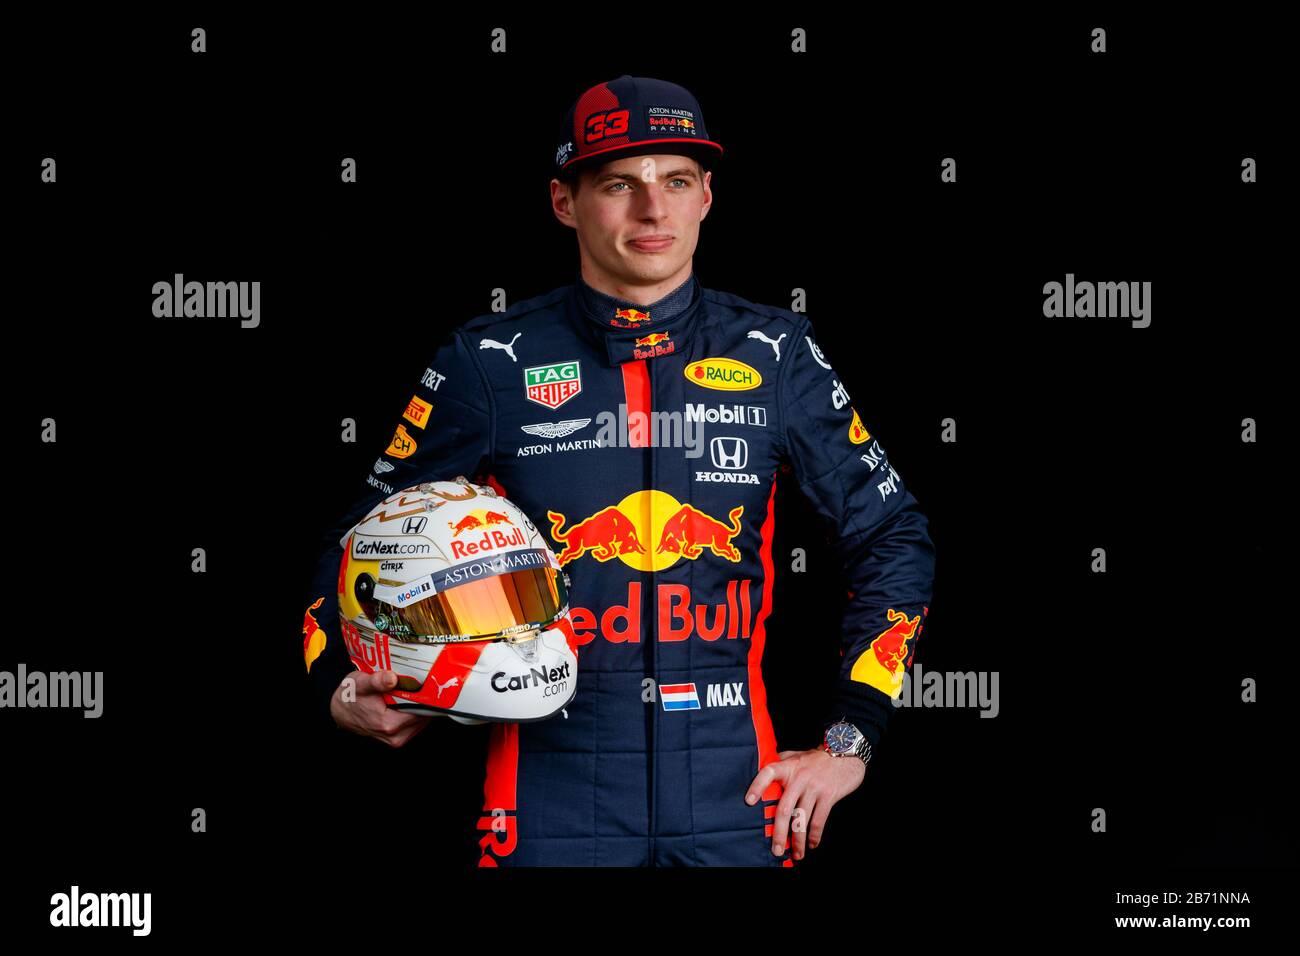 Max Verstappen (NED) Stockfoto